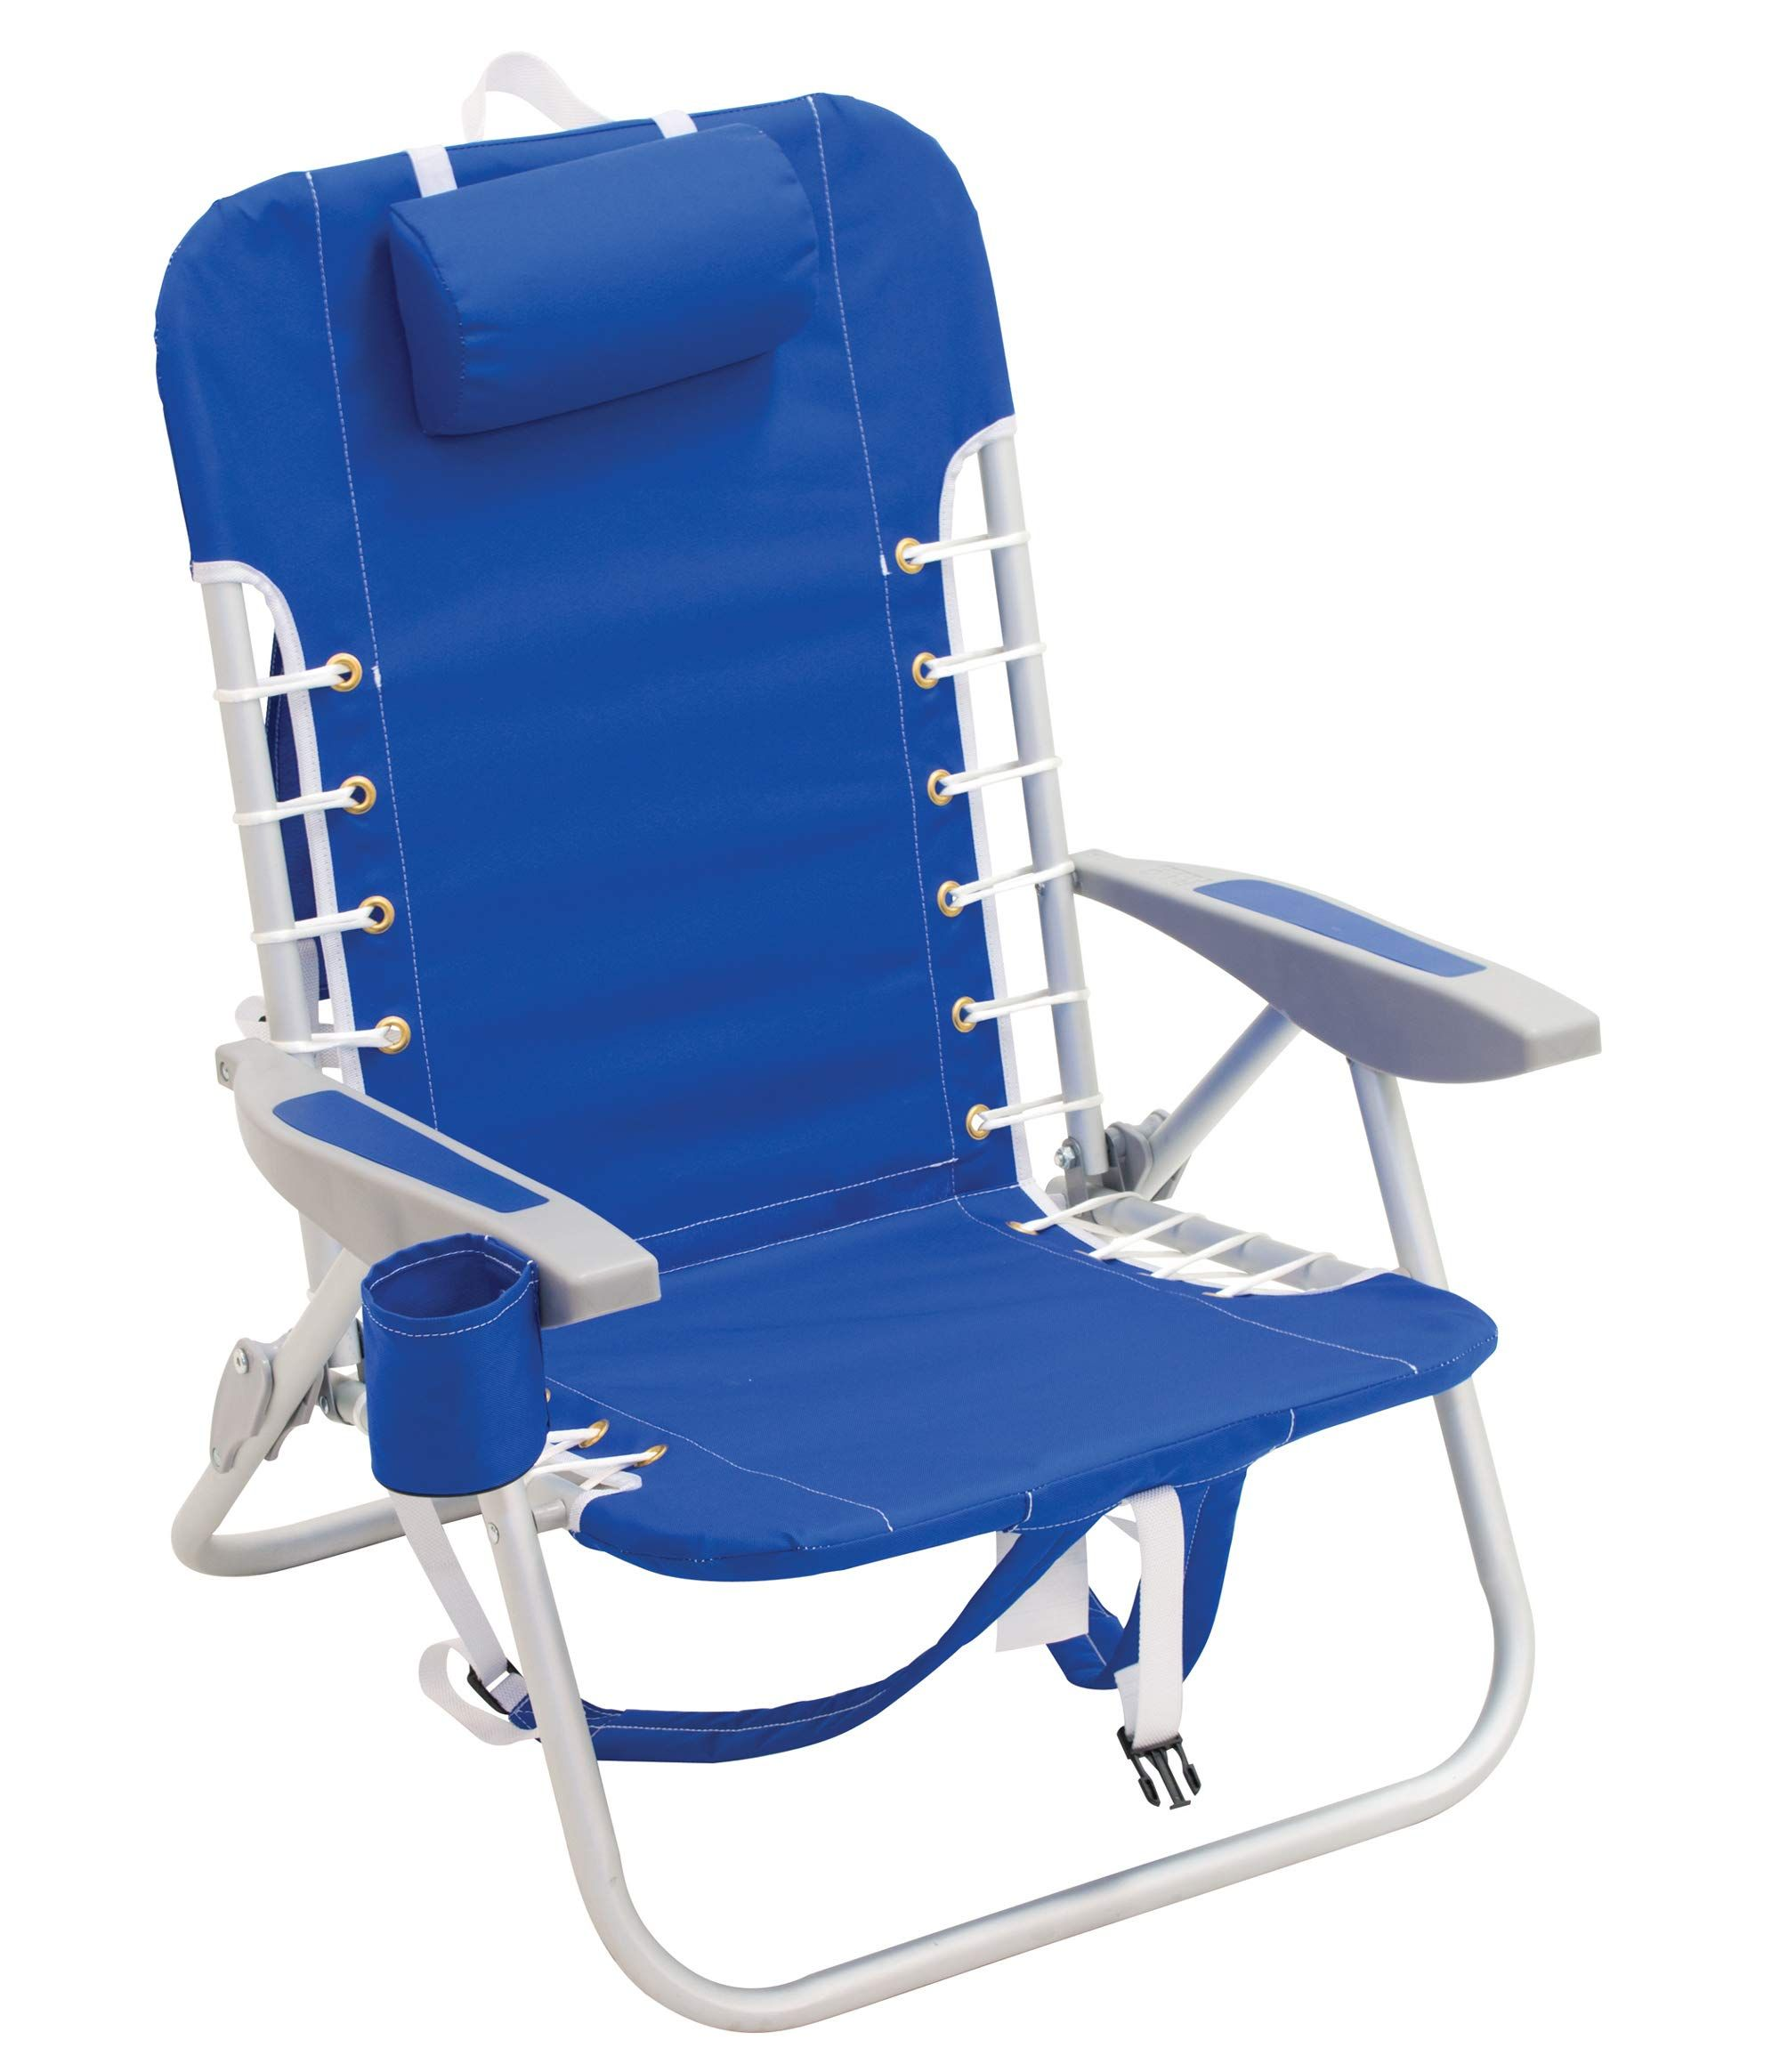 RIO Beach 4Position LaceUp Backpack Folding Beach Chair